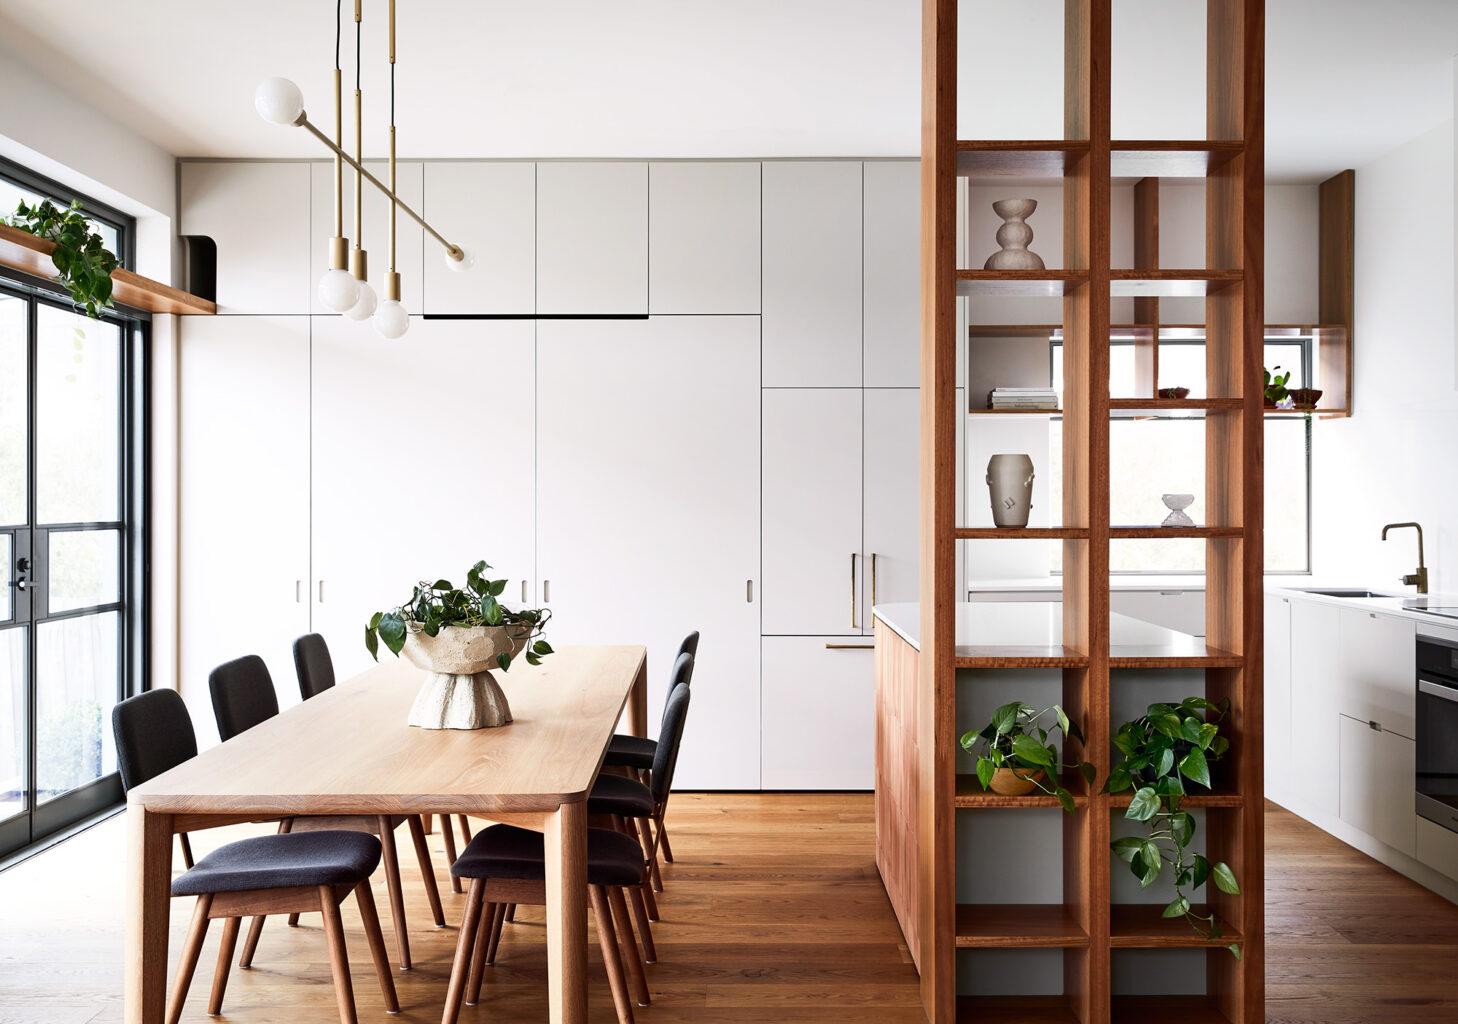 Maike Design kitchen and dining room. Open timber shelves, indoor plants, brass pendant light, teracotta tiles, timber floors.